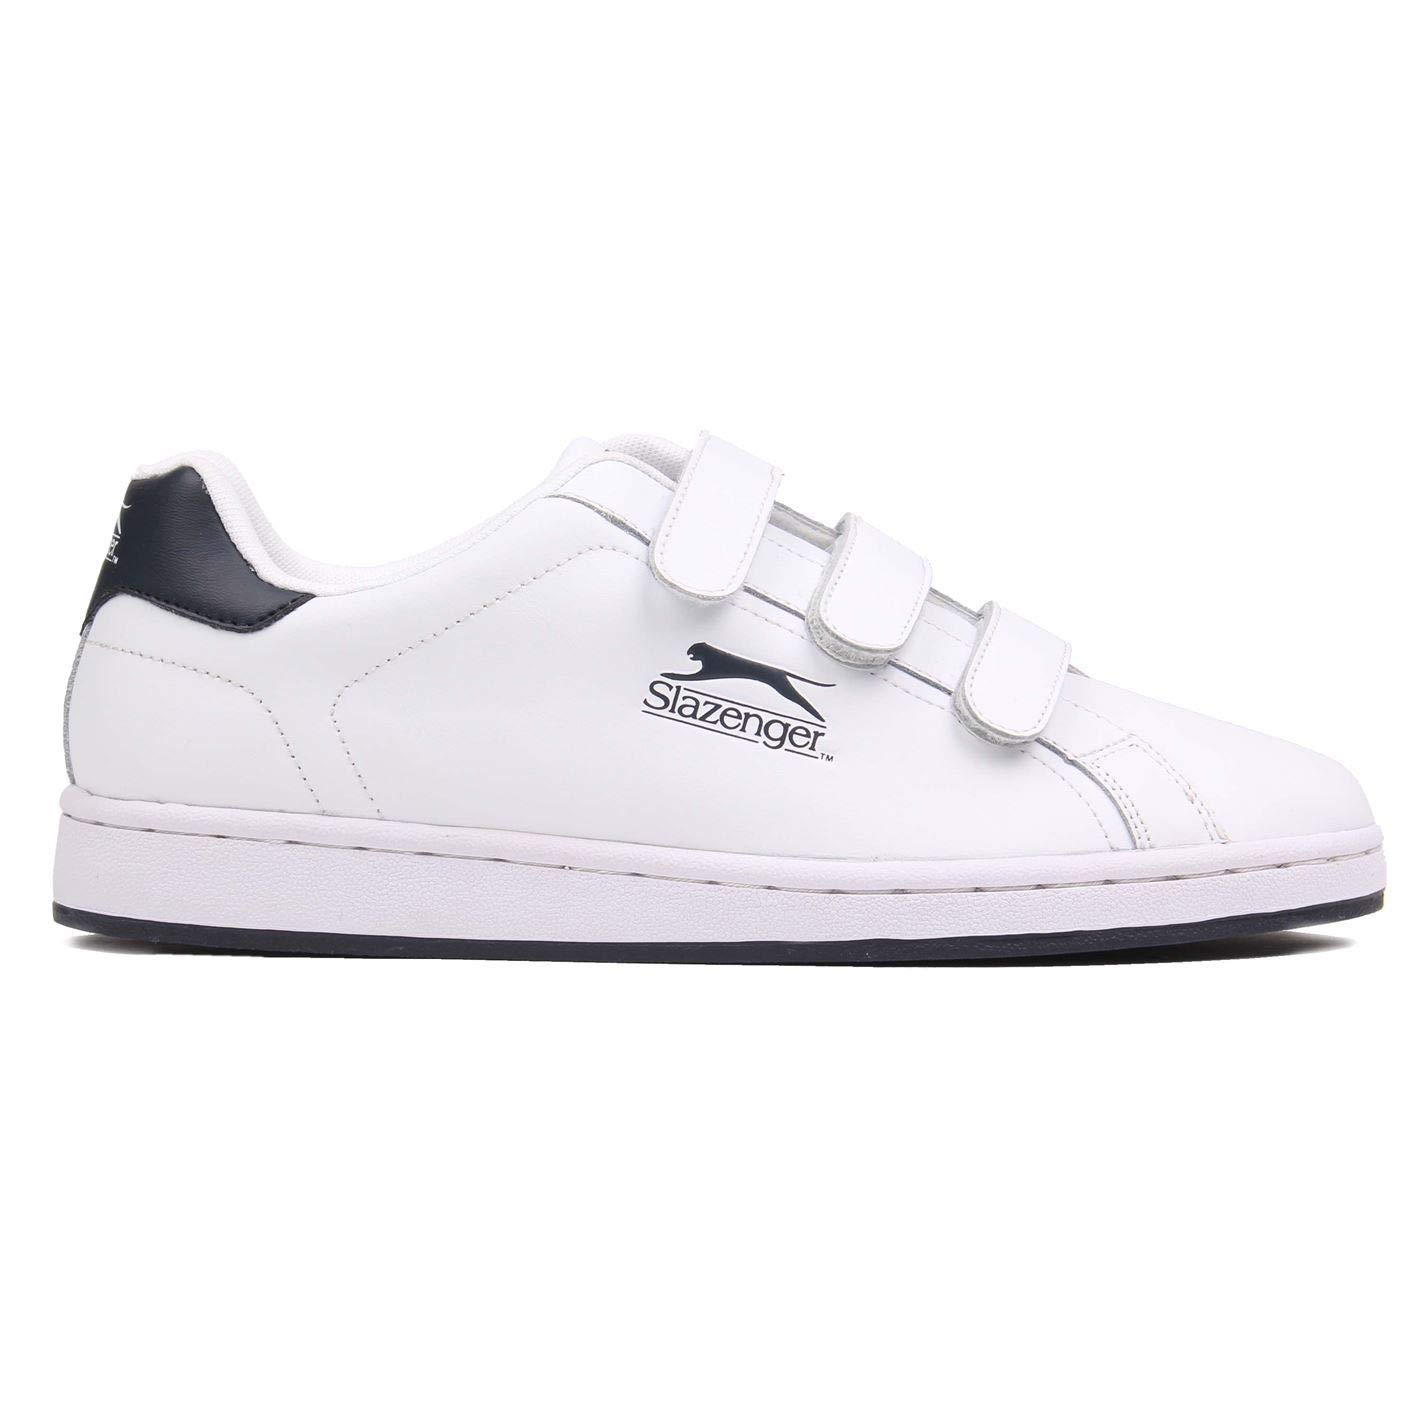 Slazenger Ash Strap Trainers Mens Athleisure Footwear Shoes Sneakers